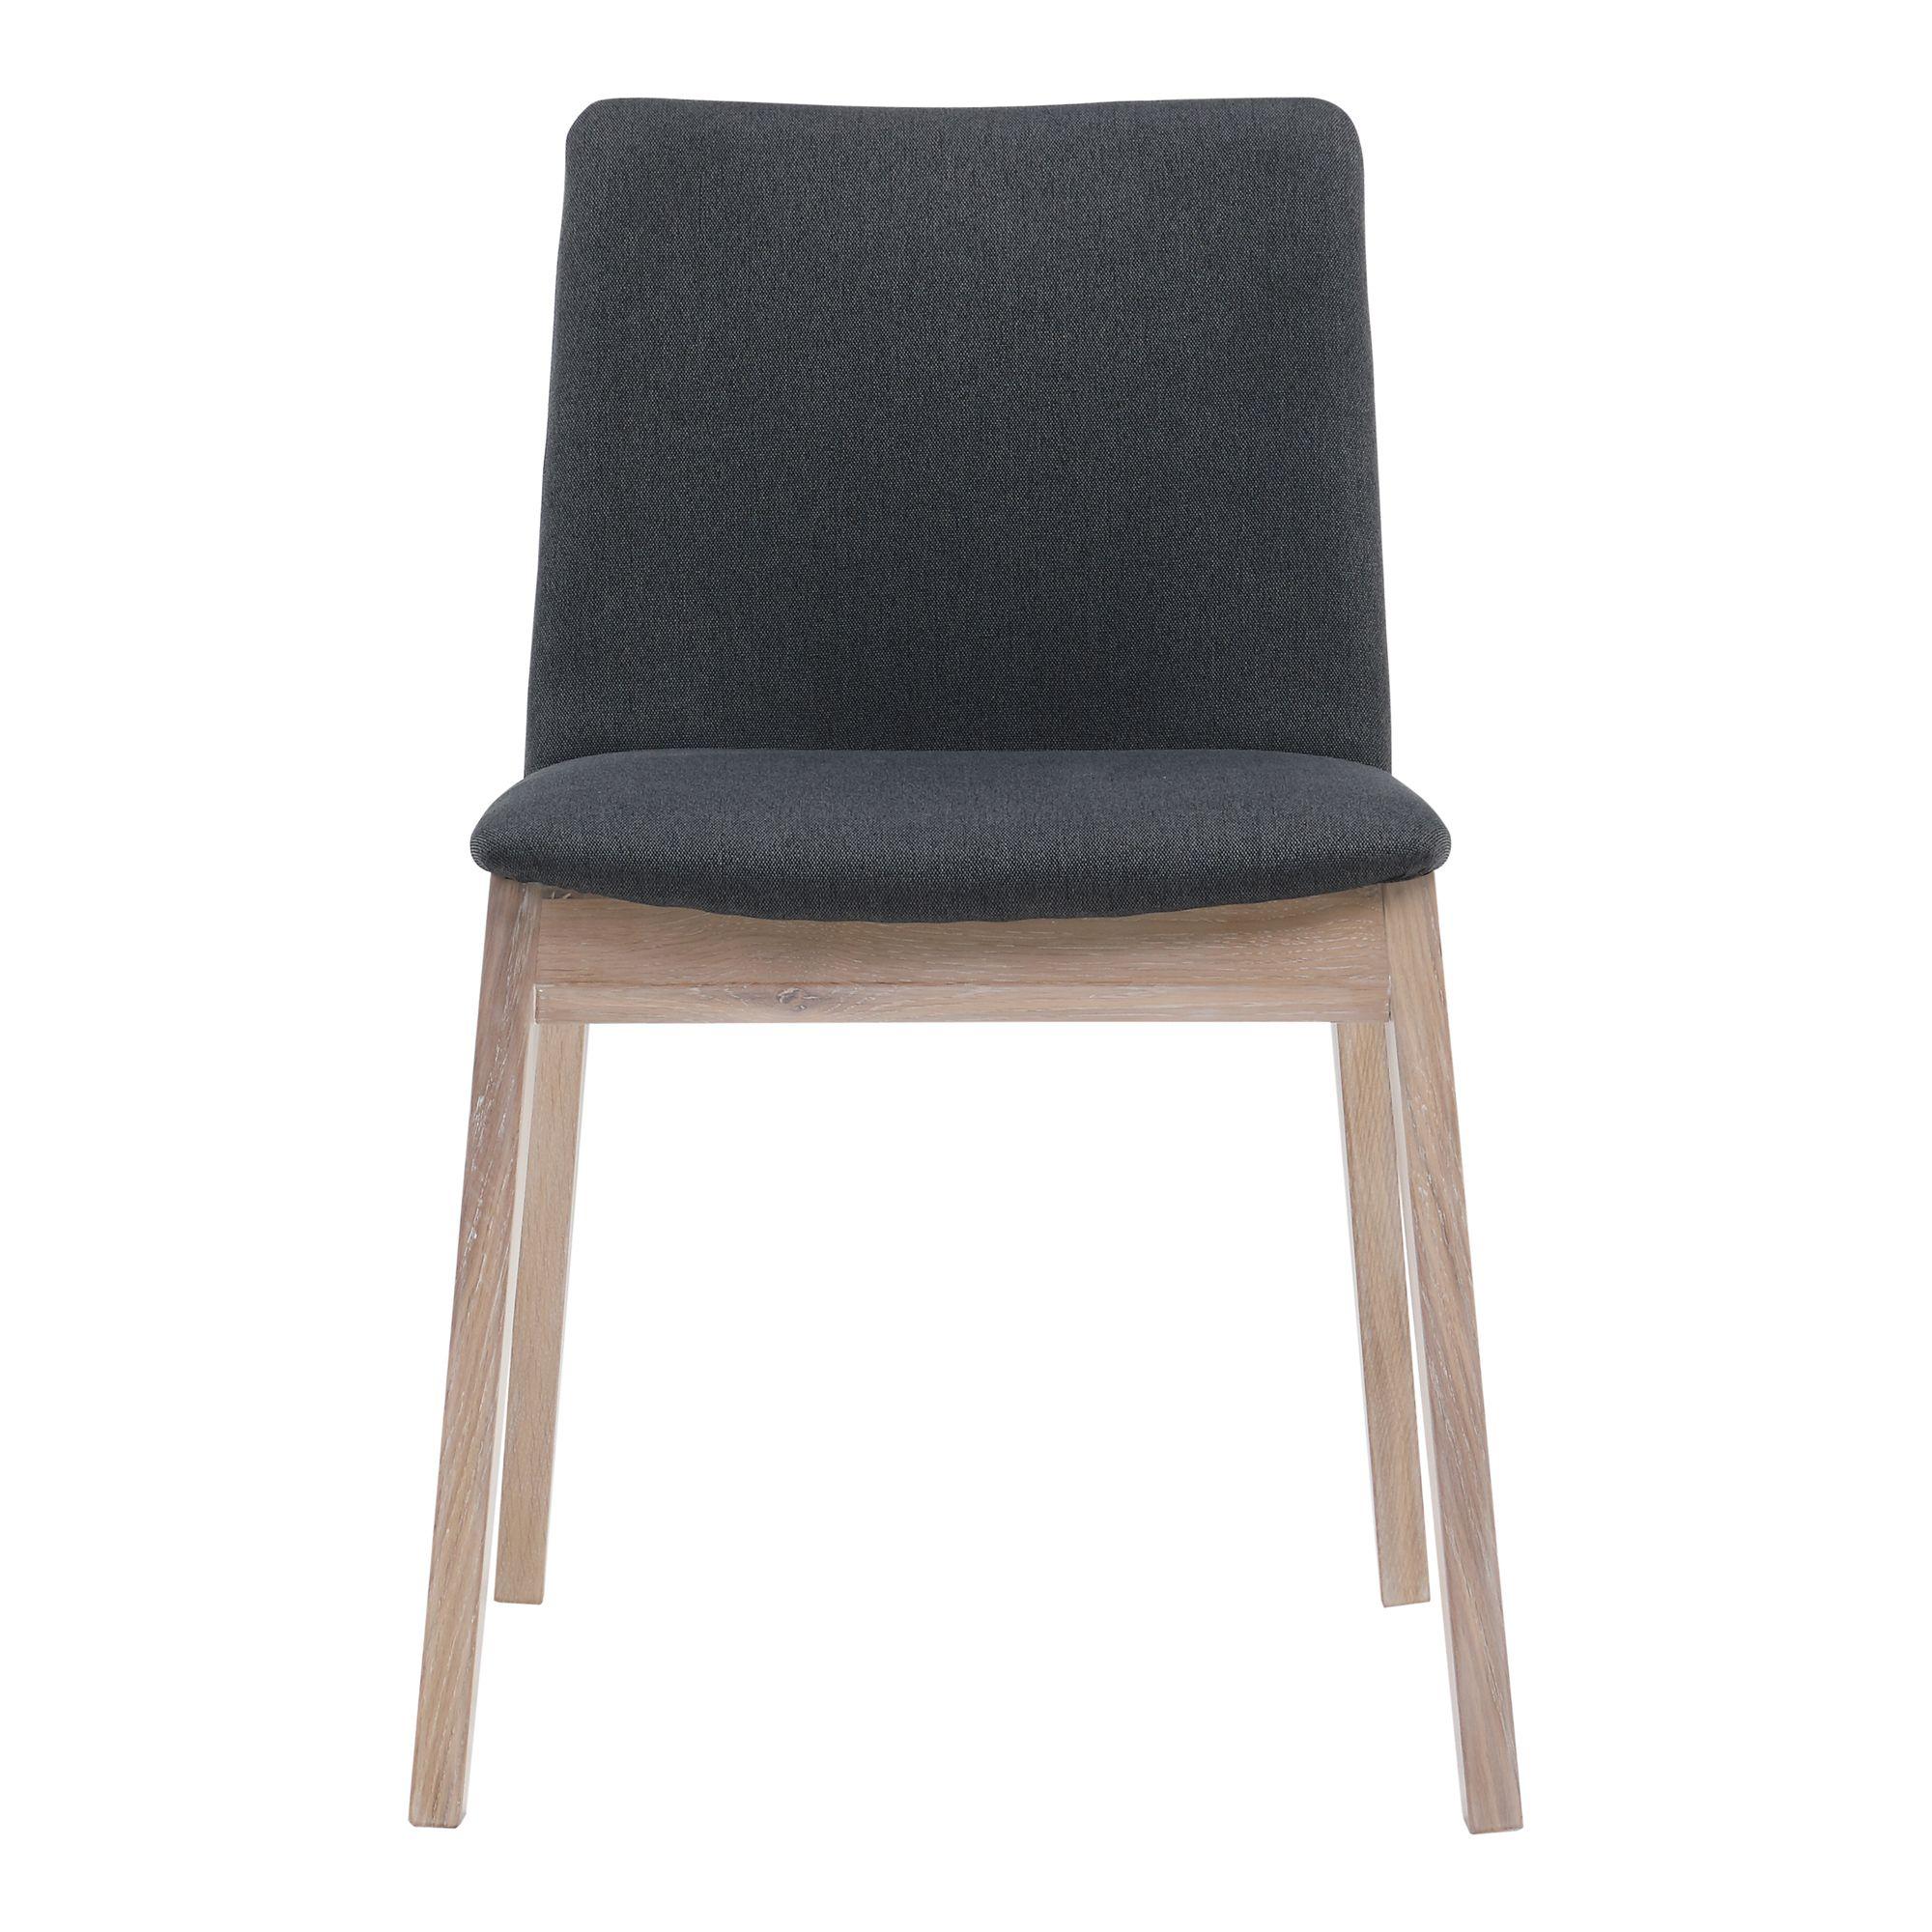 Deco Oak Dining Chair Dark Grey M2 Moe S Wholesale Dining Chairs Oak Dining Chairs Black Dining Chairs Modern